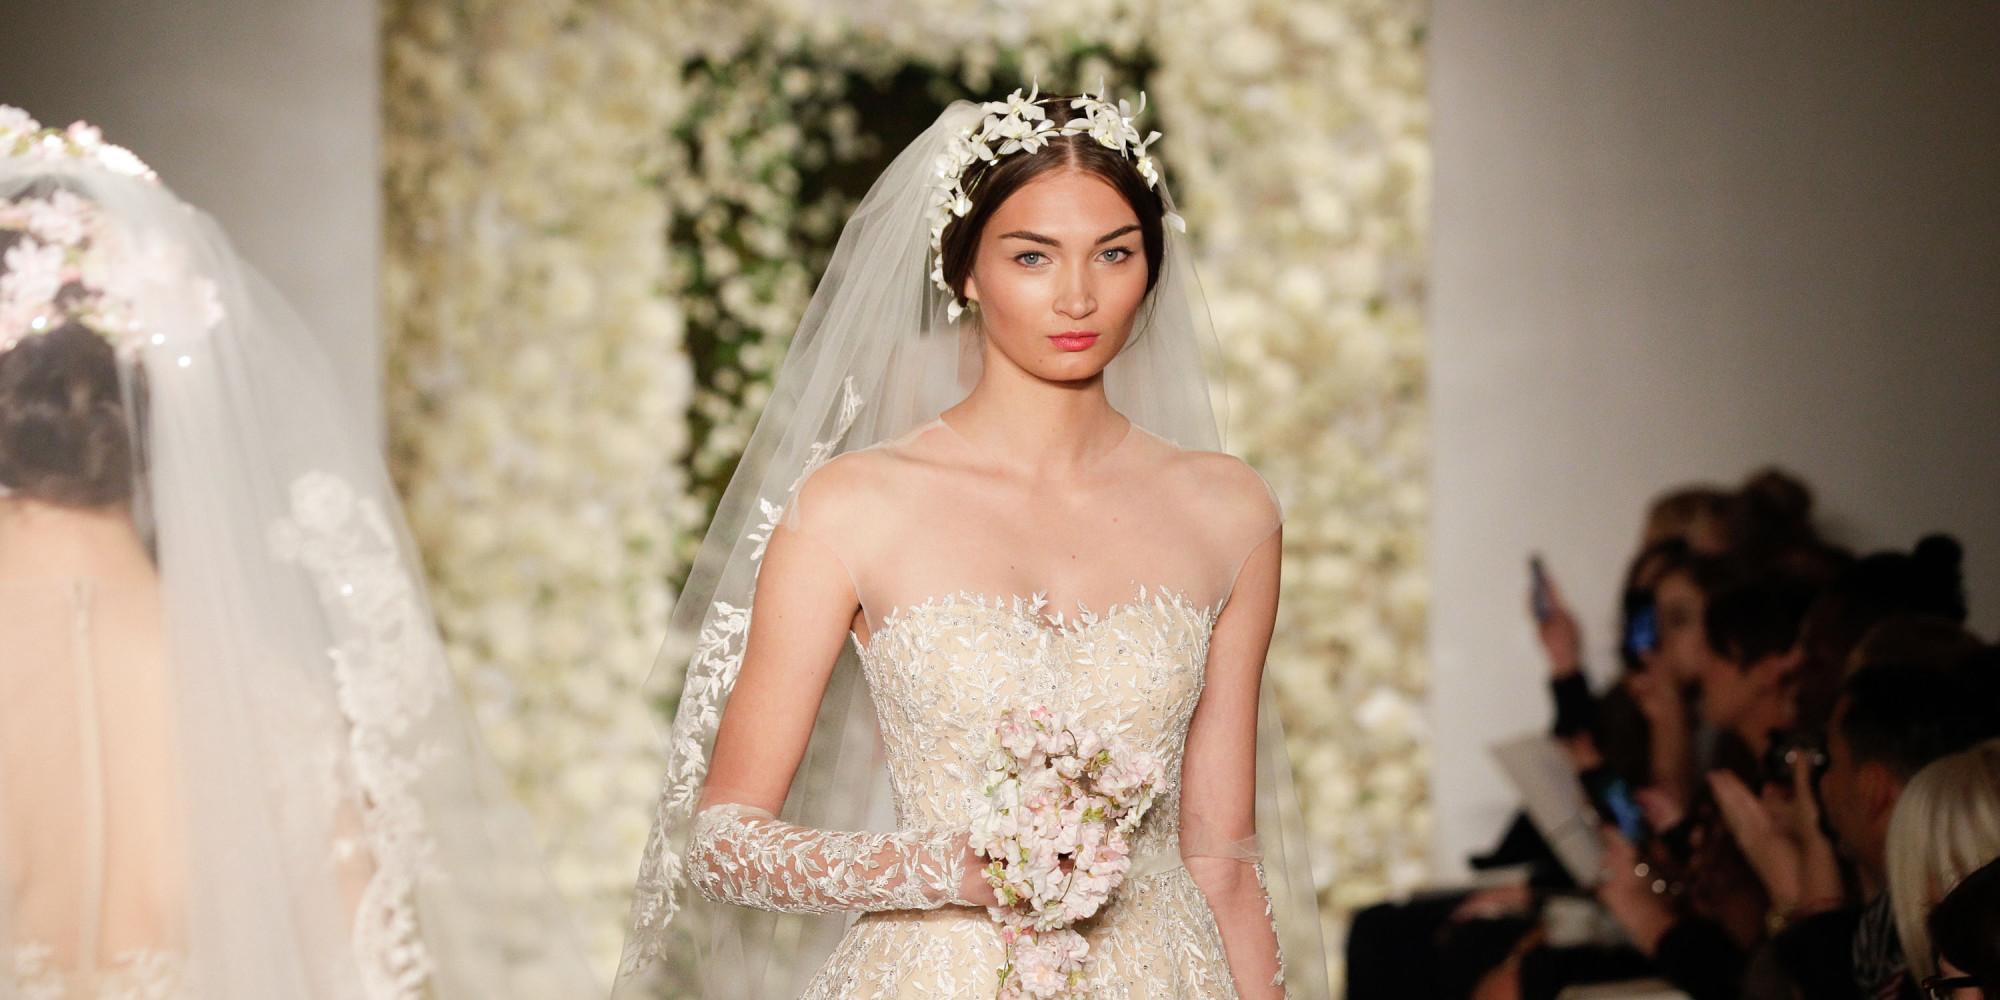 Jessica mulroney jessicamulroney twitter for Jessica designs international wedding dresses